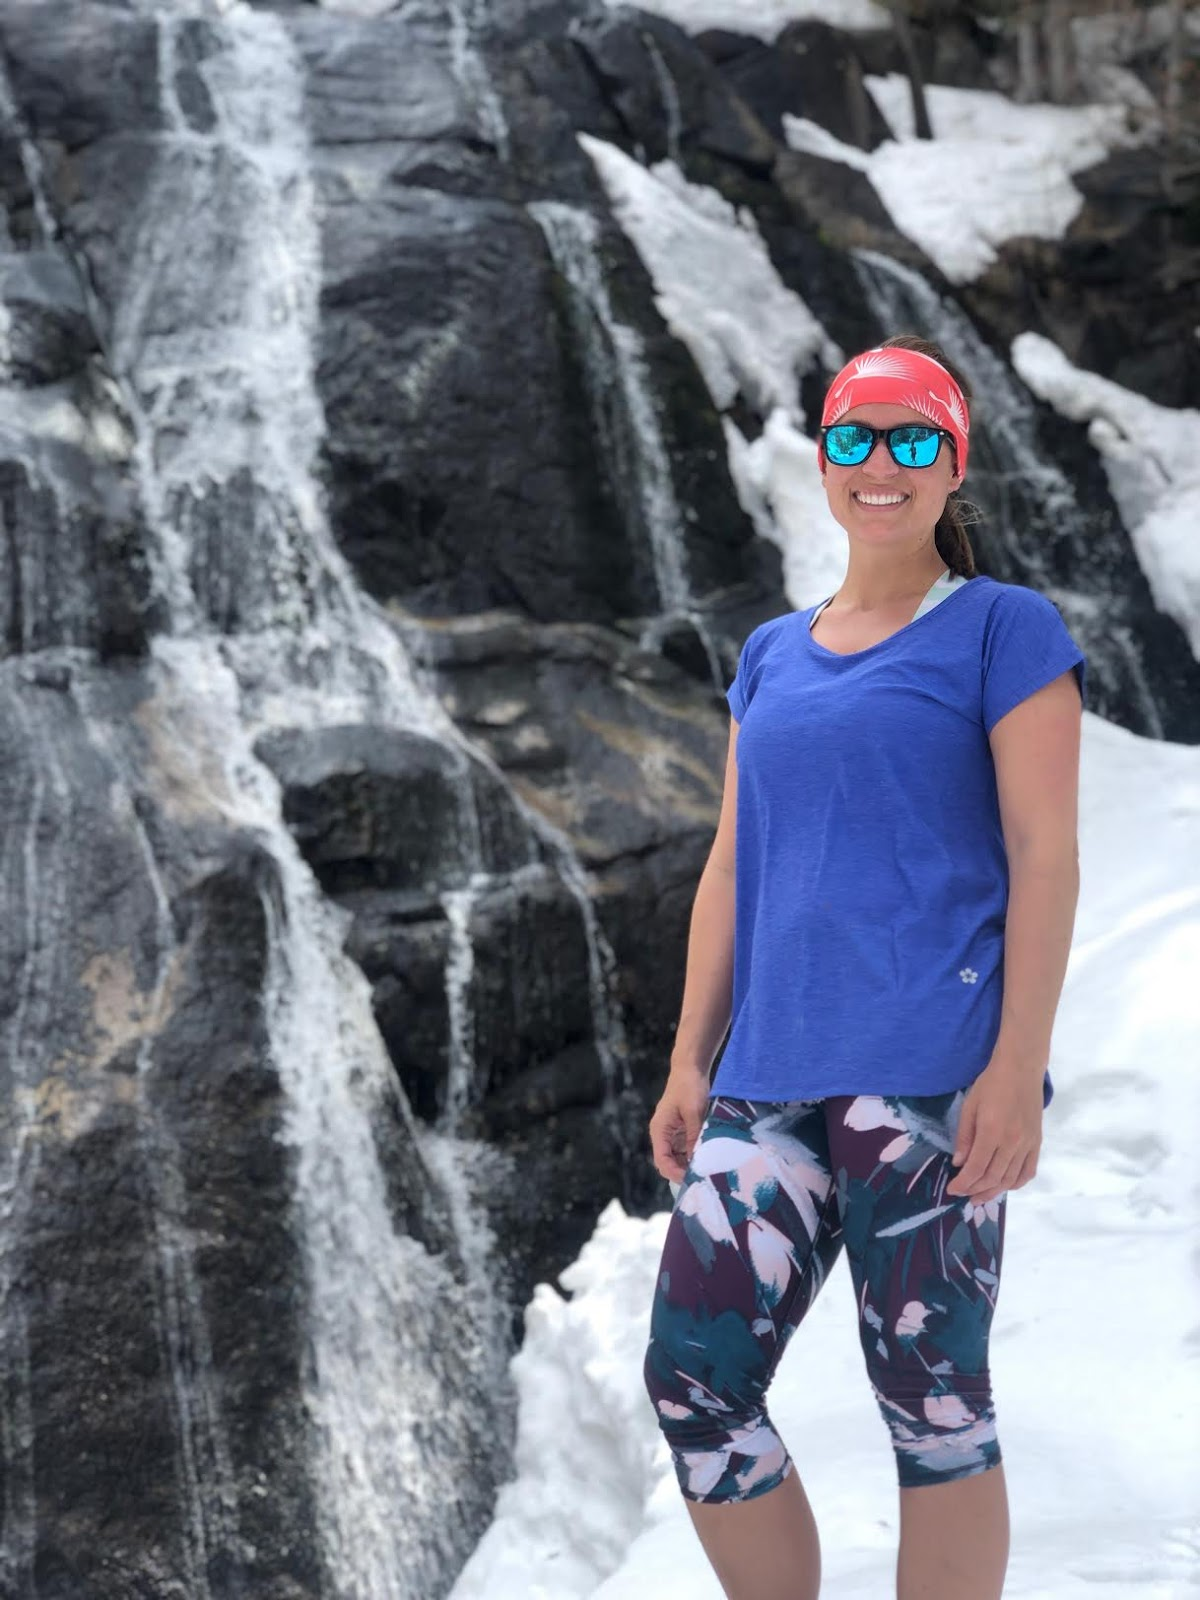 Hiking to Bells Canyon Waterfall